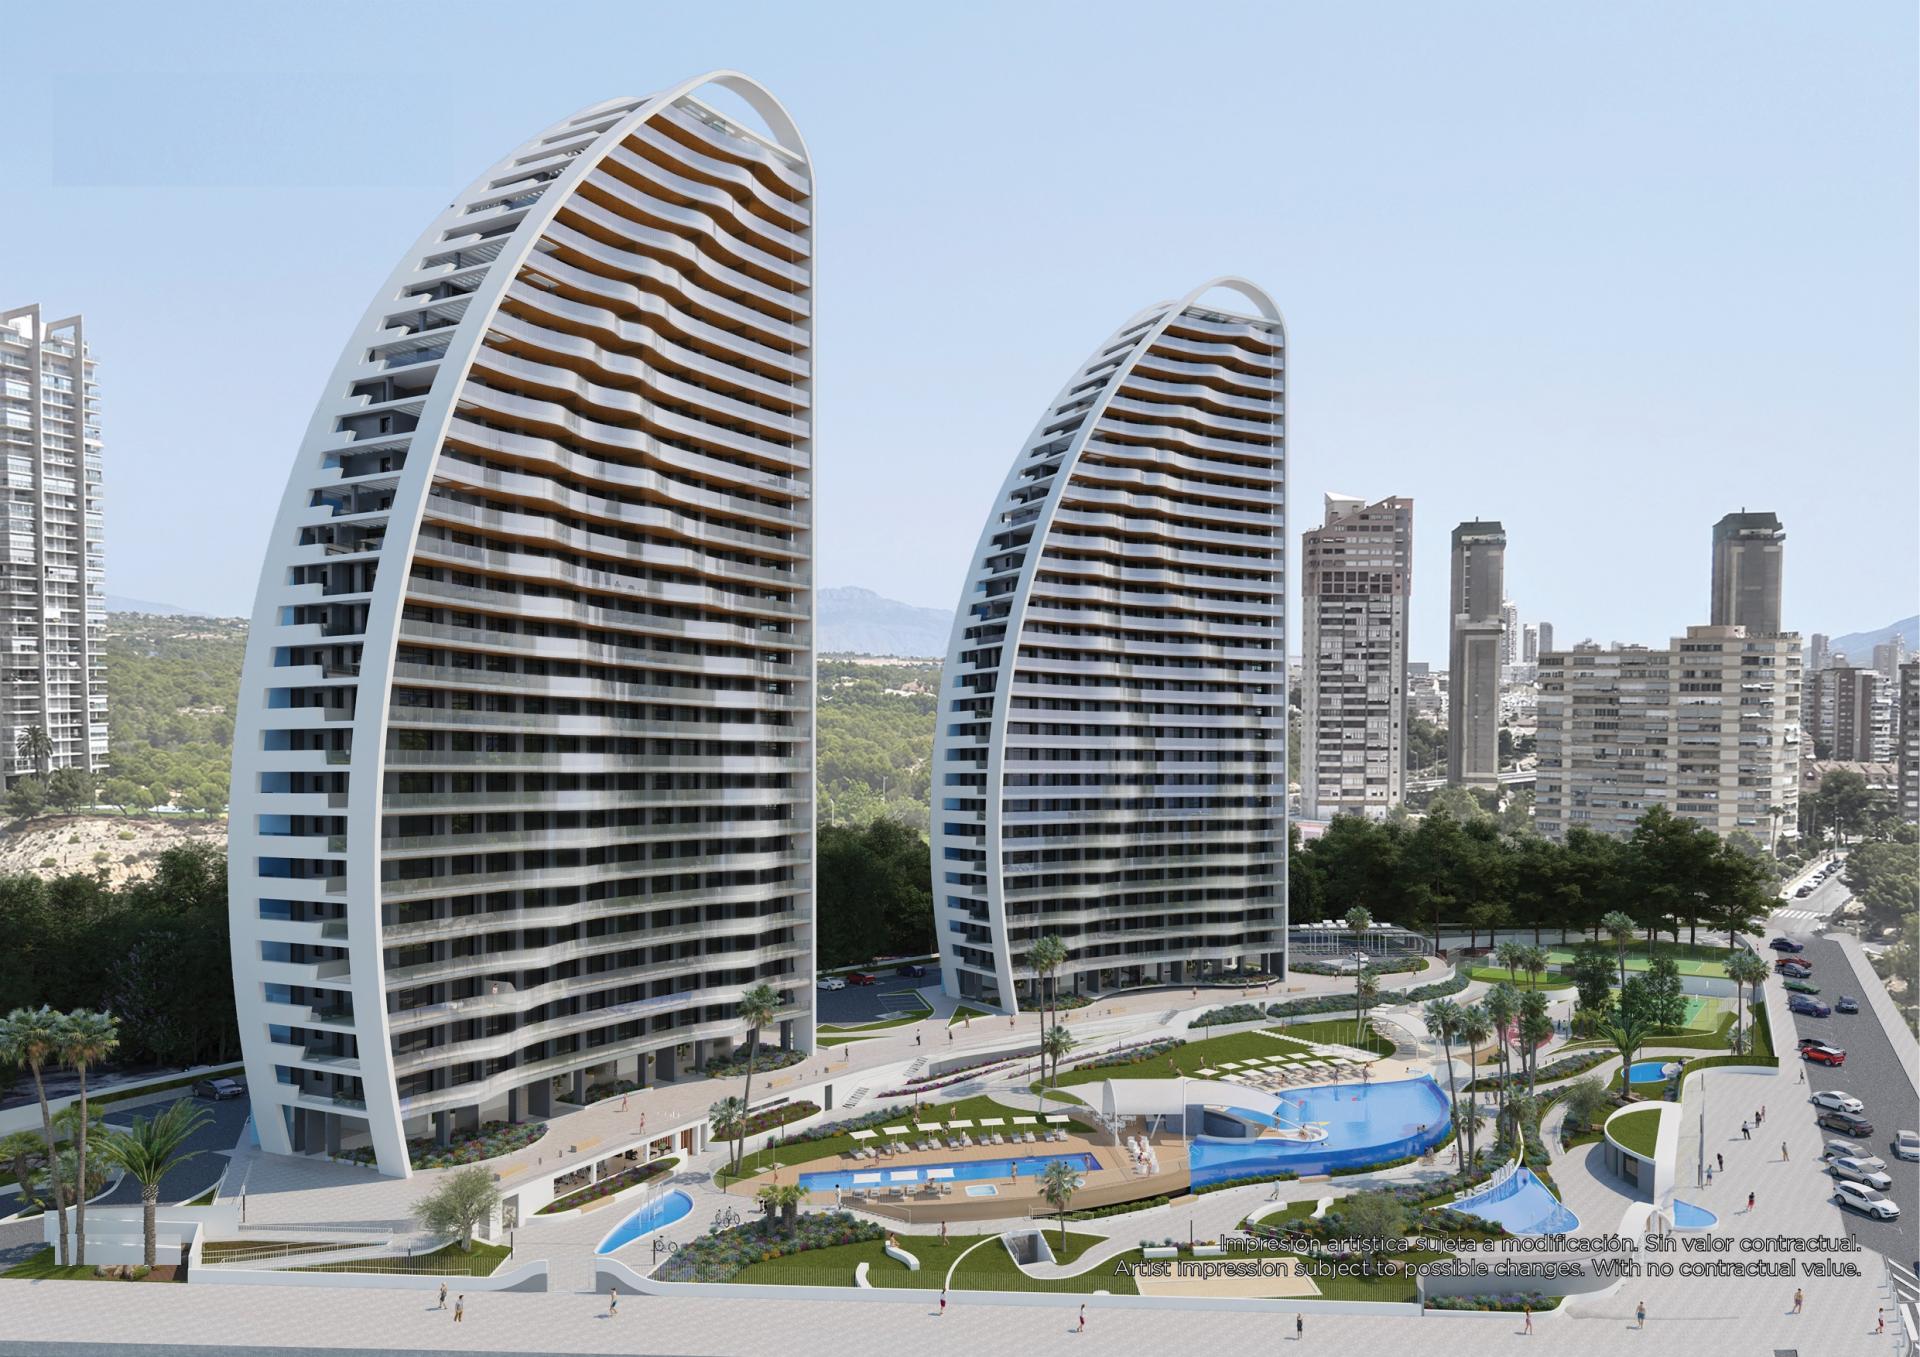 Apartment for sale in Benidorm 295.000 € | Ref: SE4056